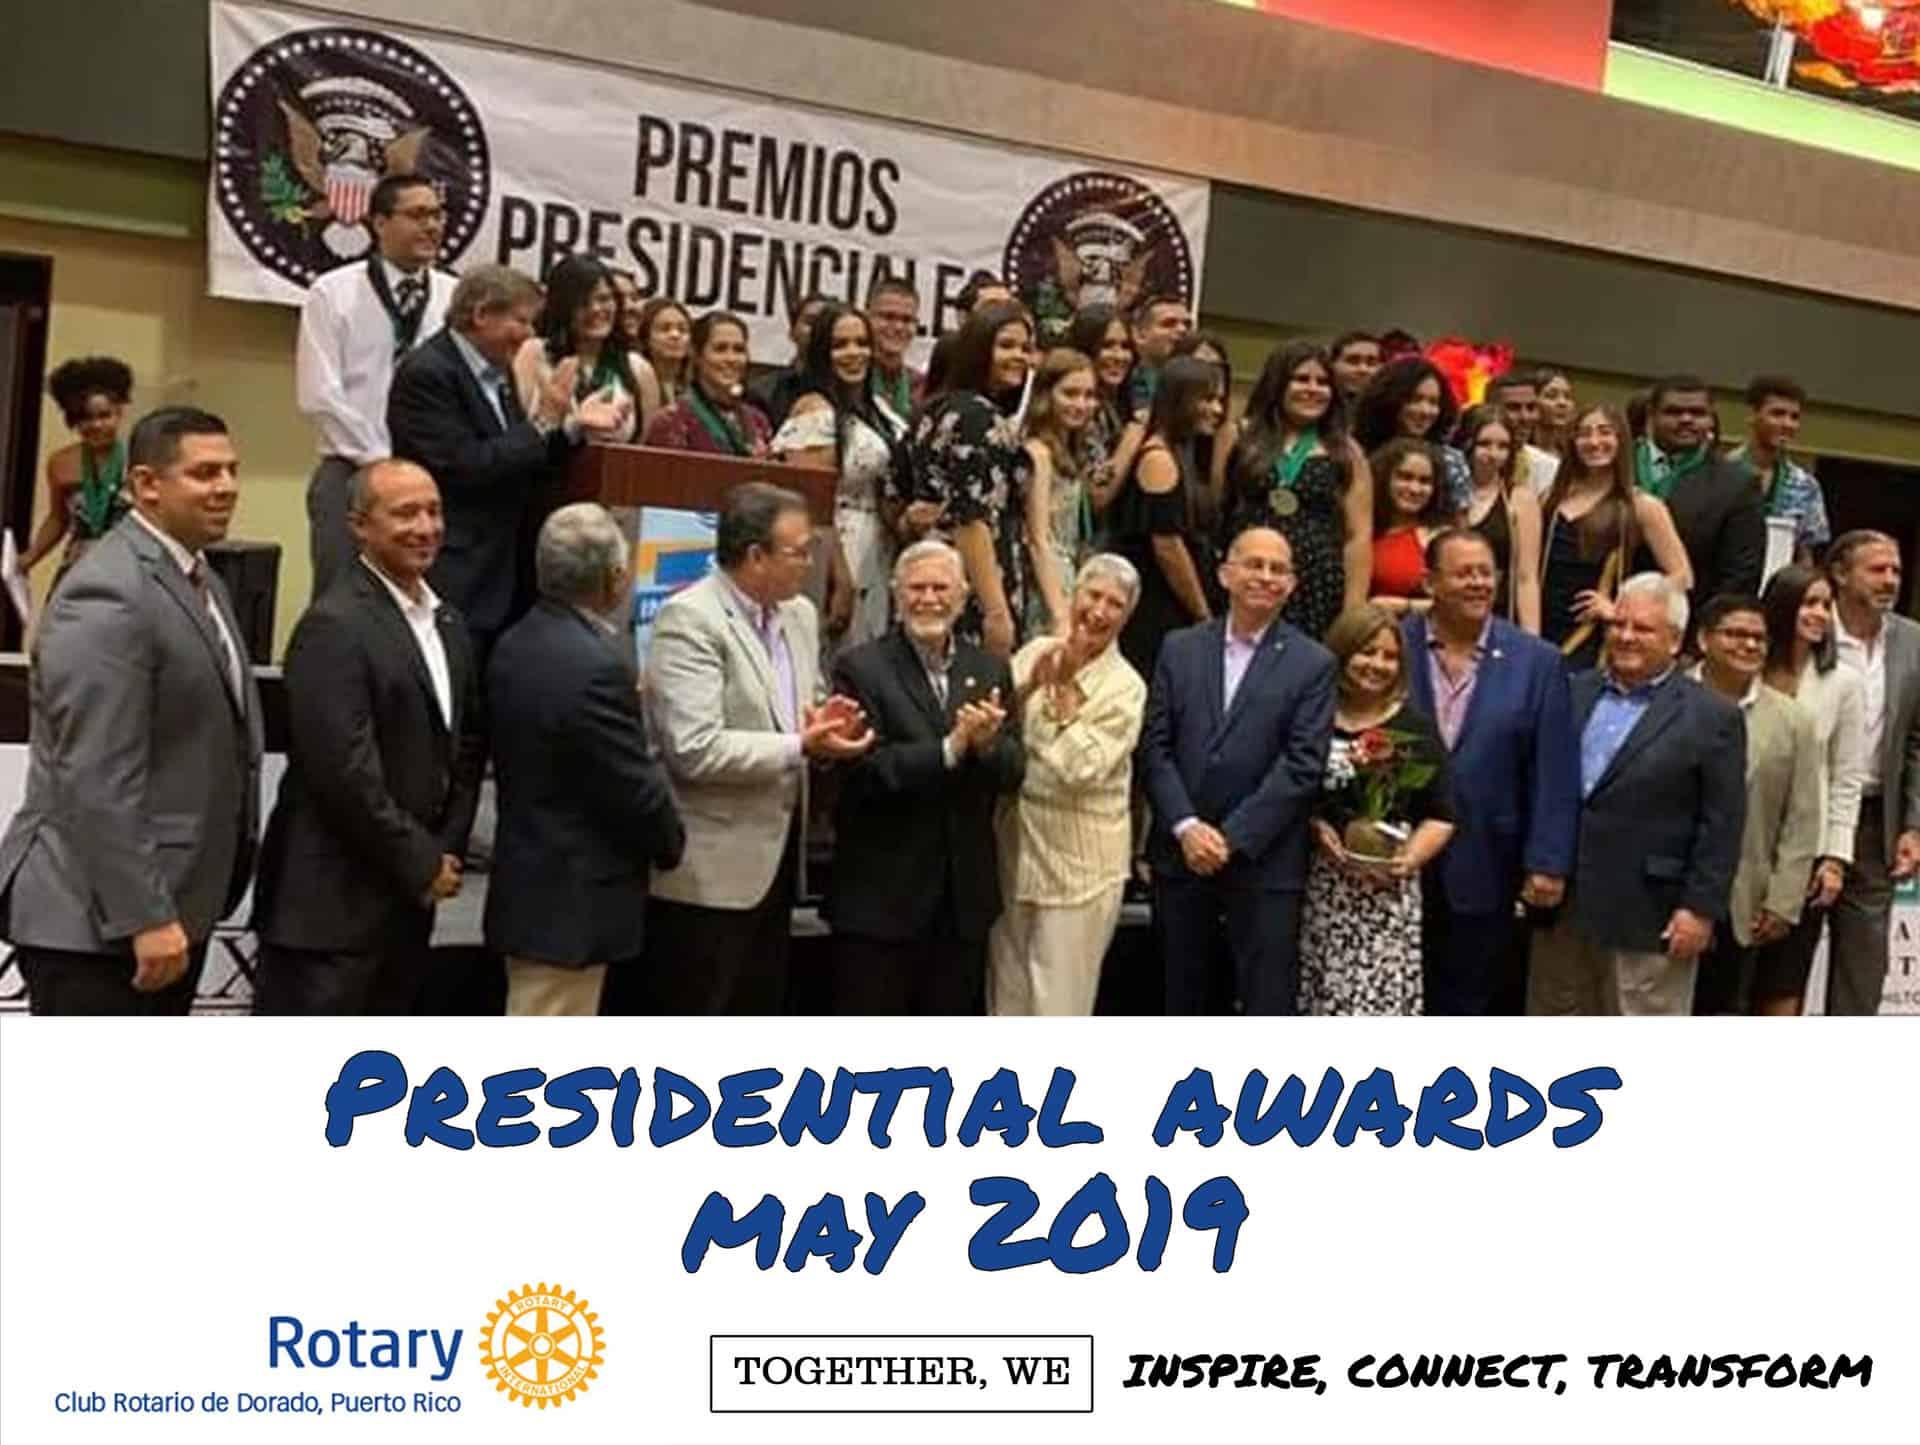 Presidential awards 2019